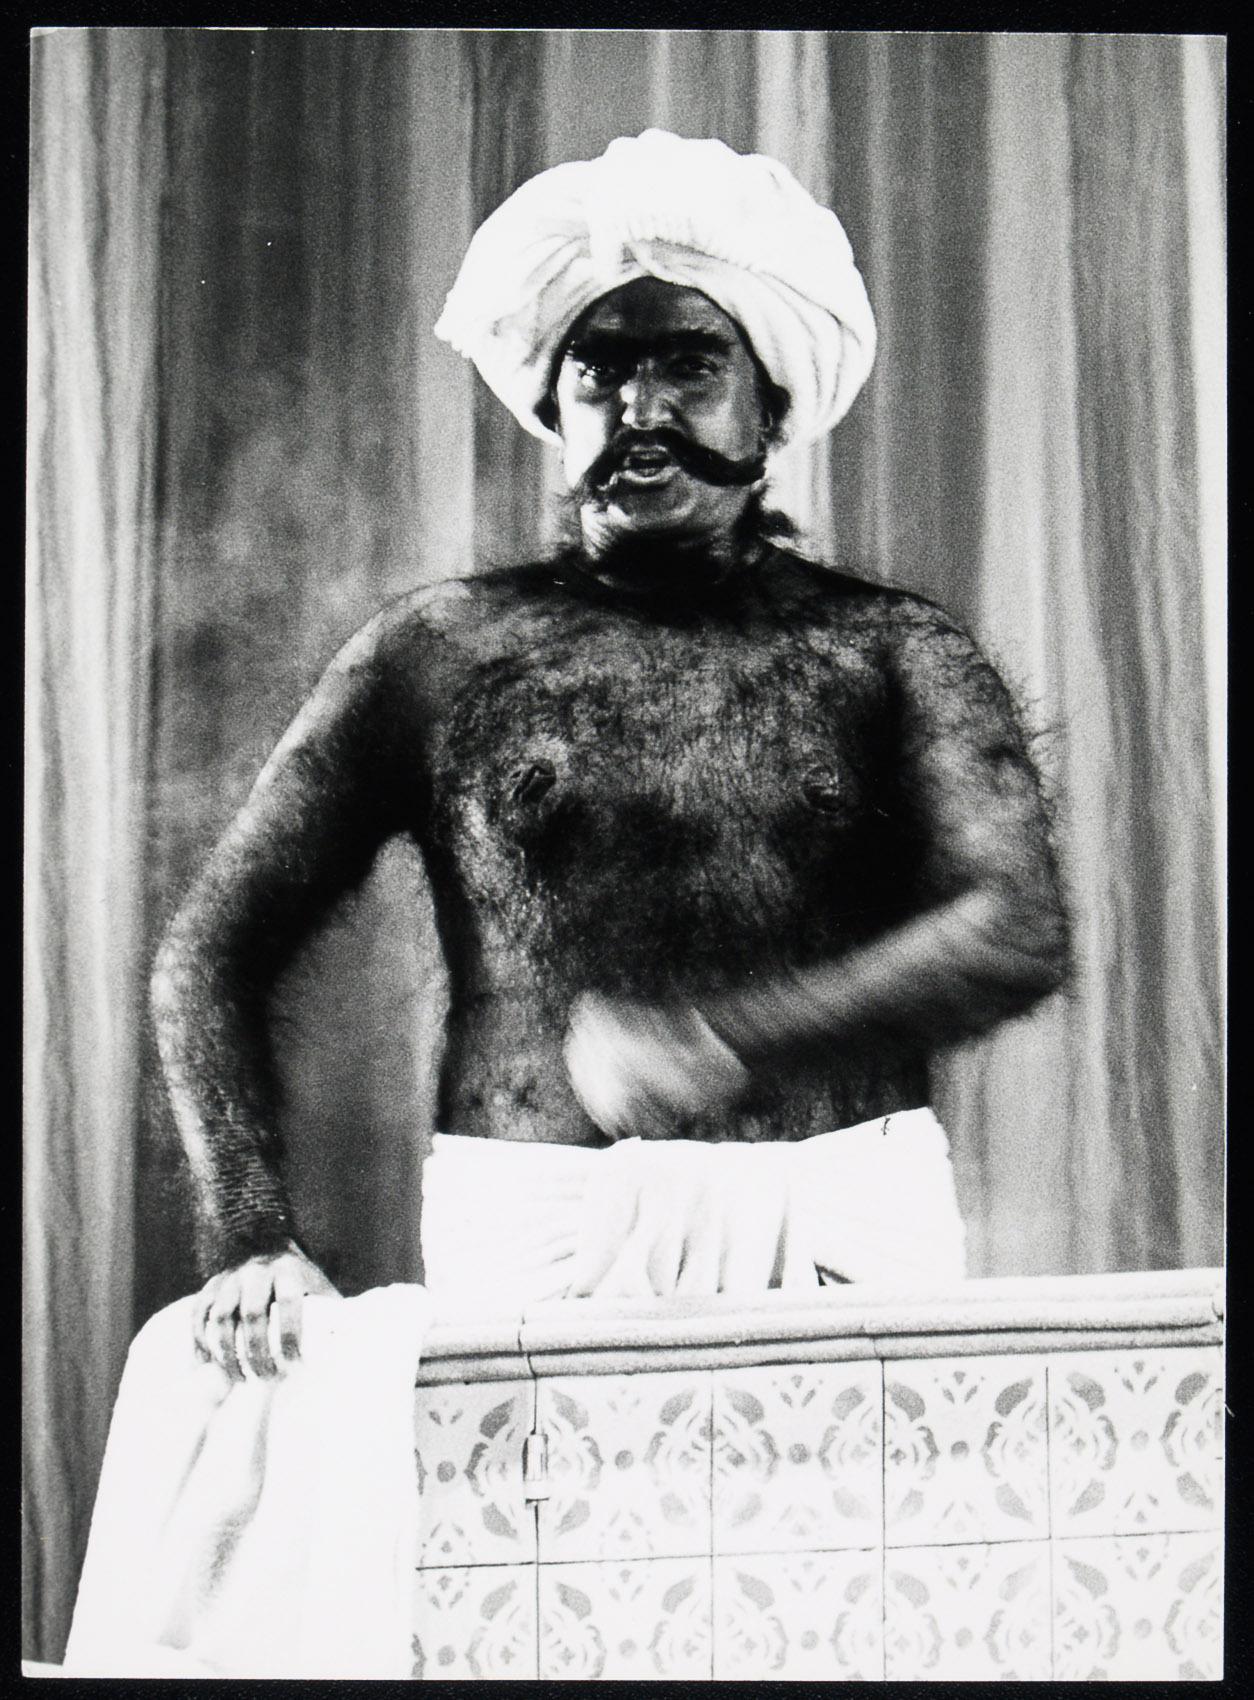 Ruggero Raimondi von Josef Palffy, Wien